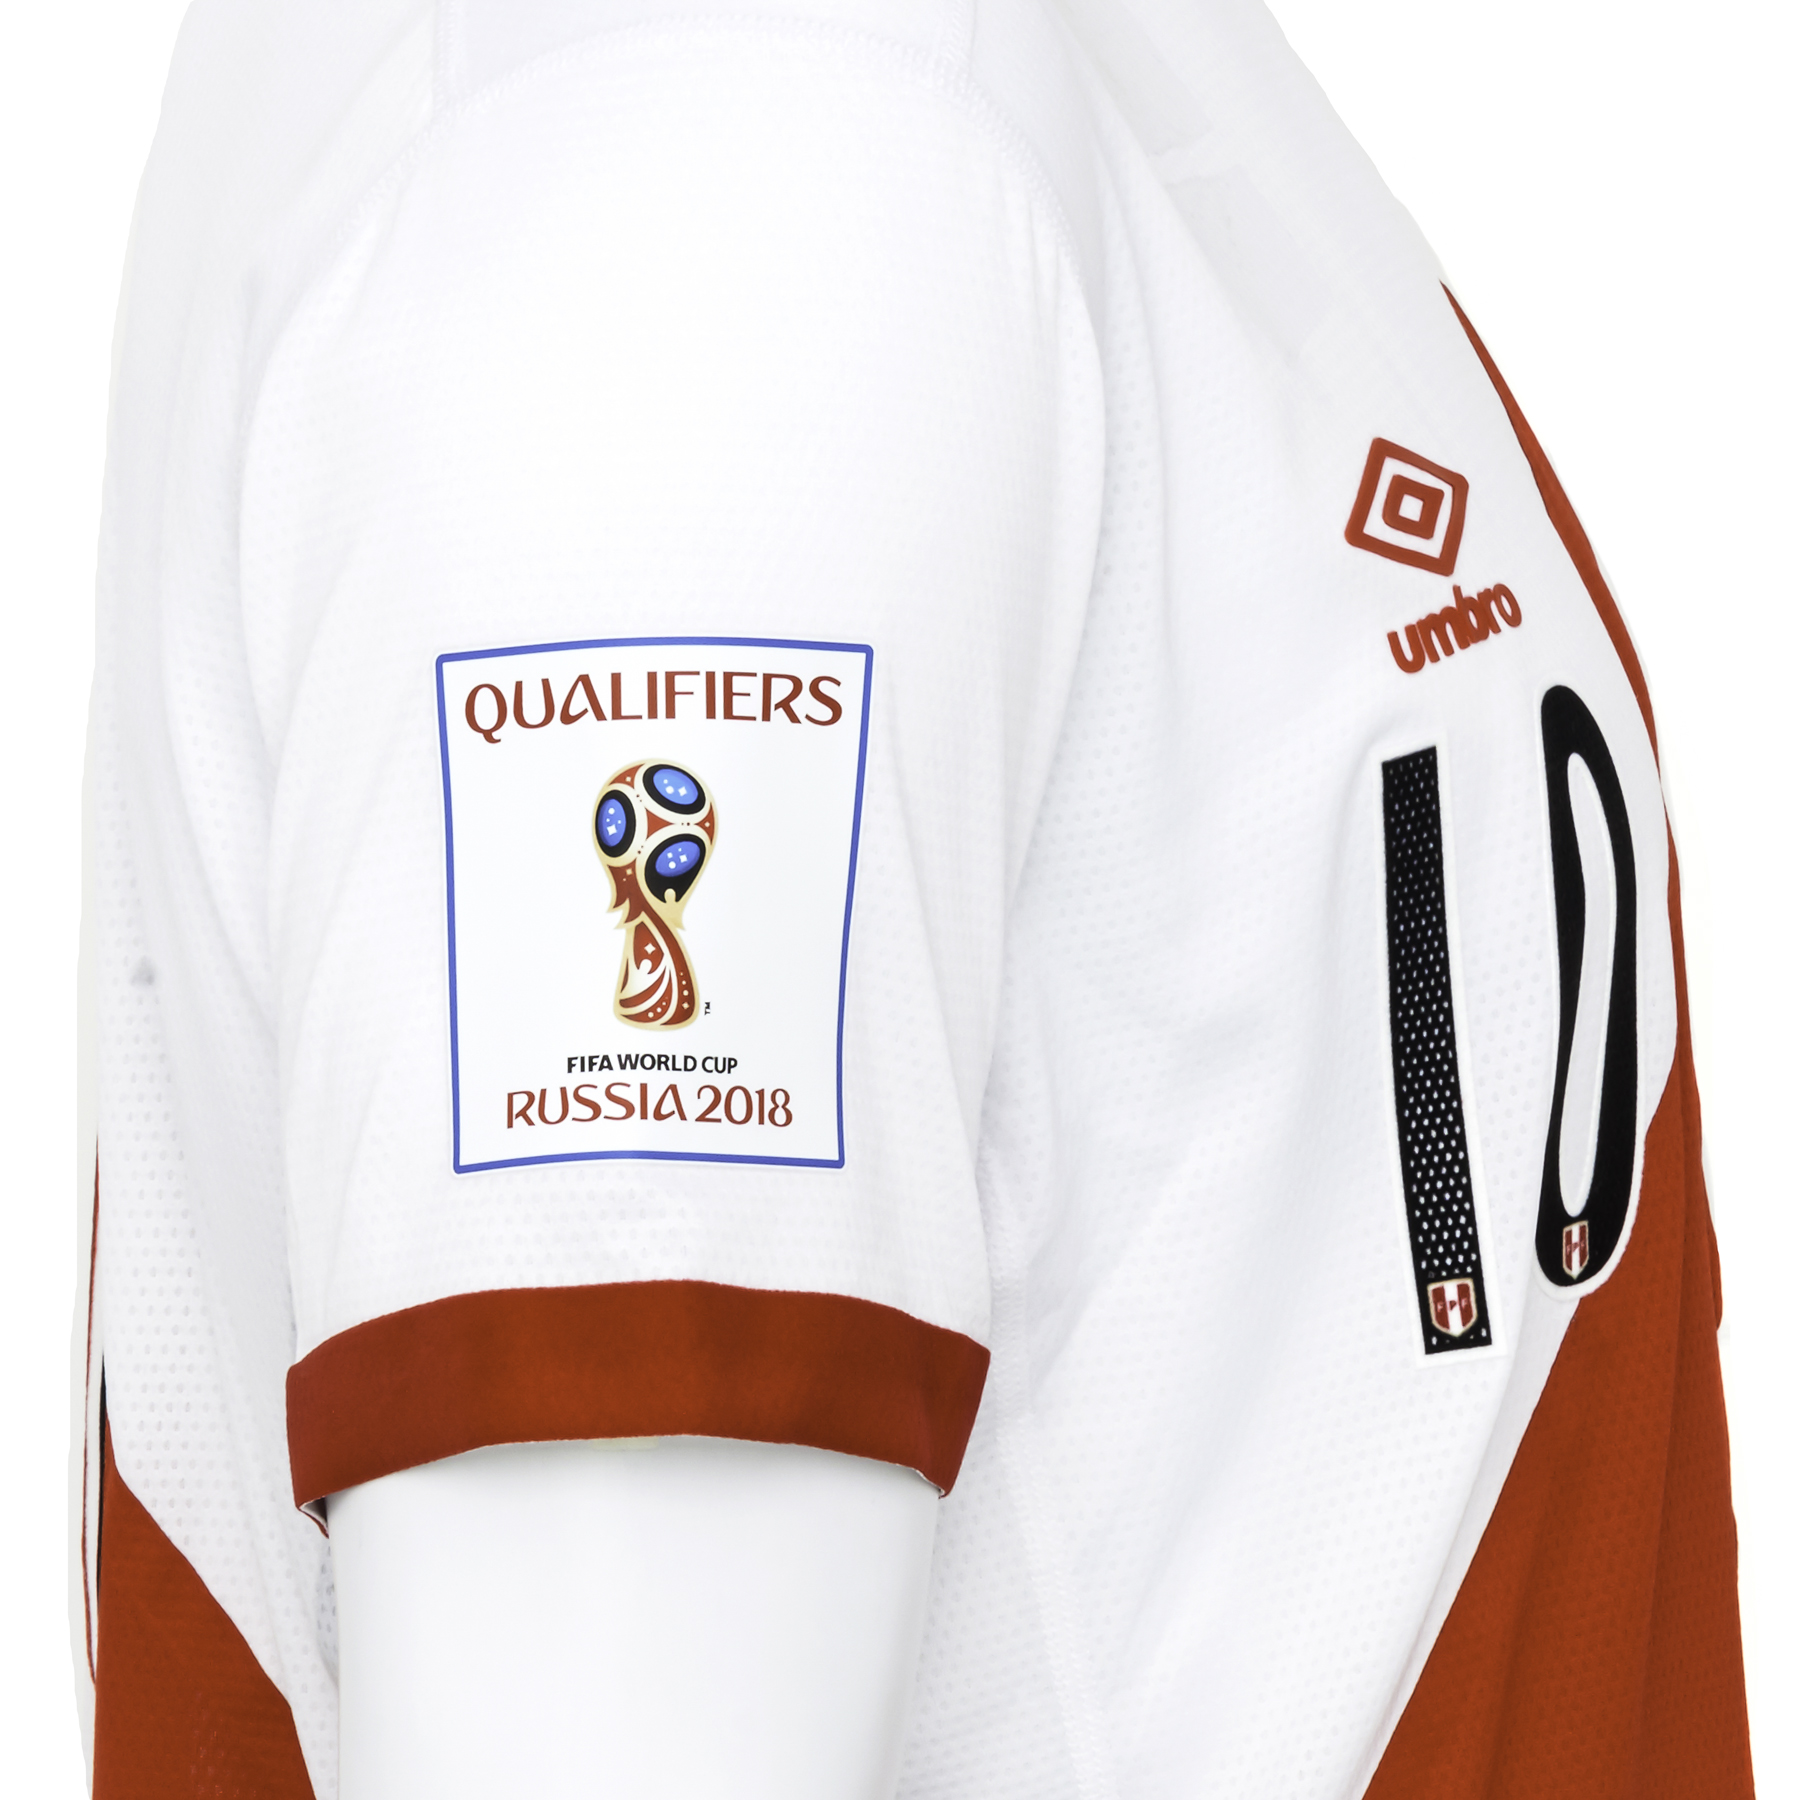 6175acdd6 ... Lot 457 - JEFFERSON FARFAN 2018 WORLD CUP QUALIFIER PERU MATCH WORN  JERSEY ...